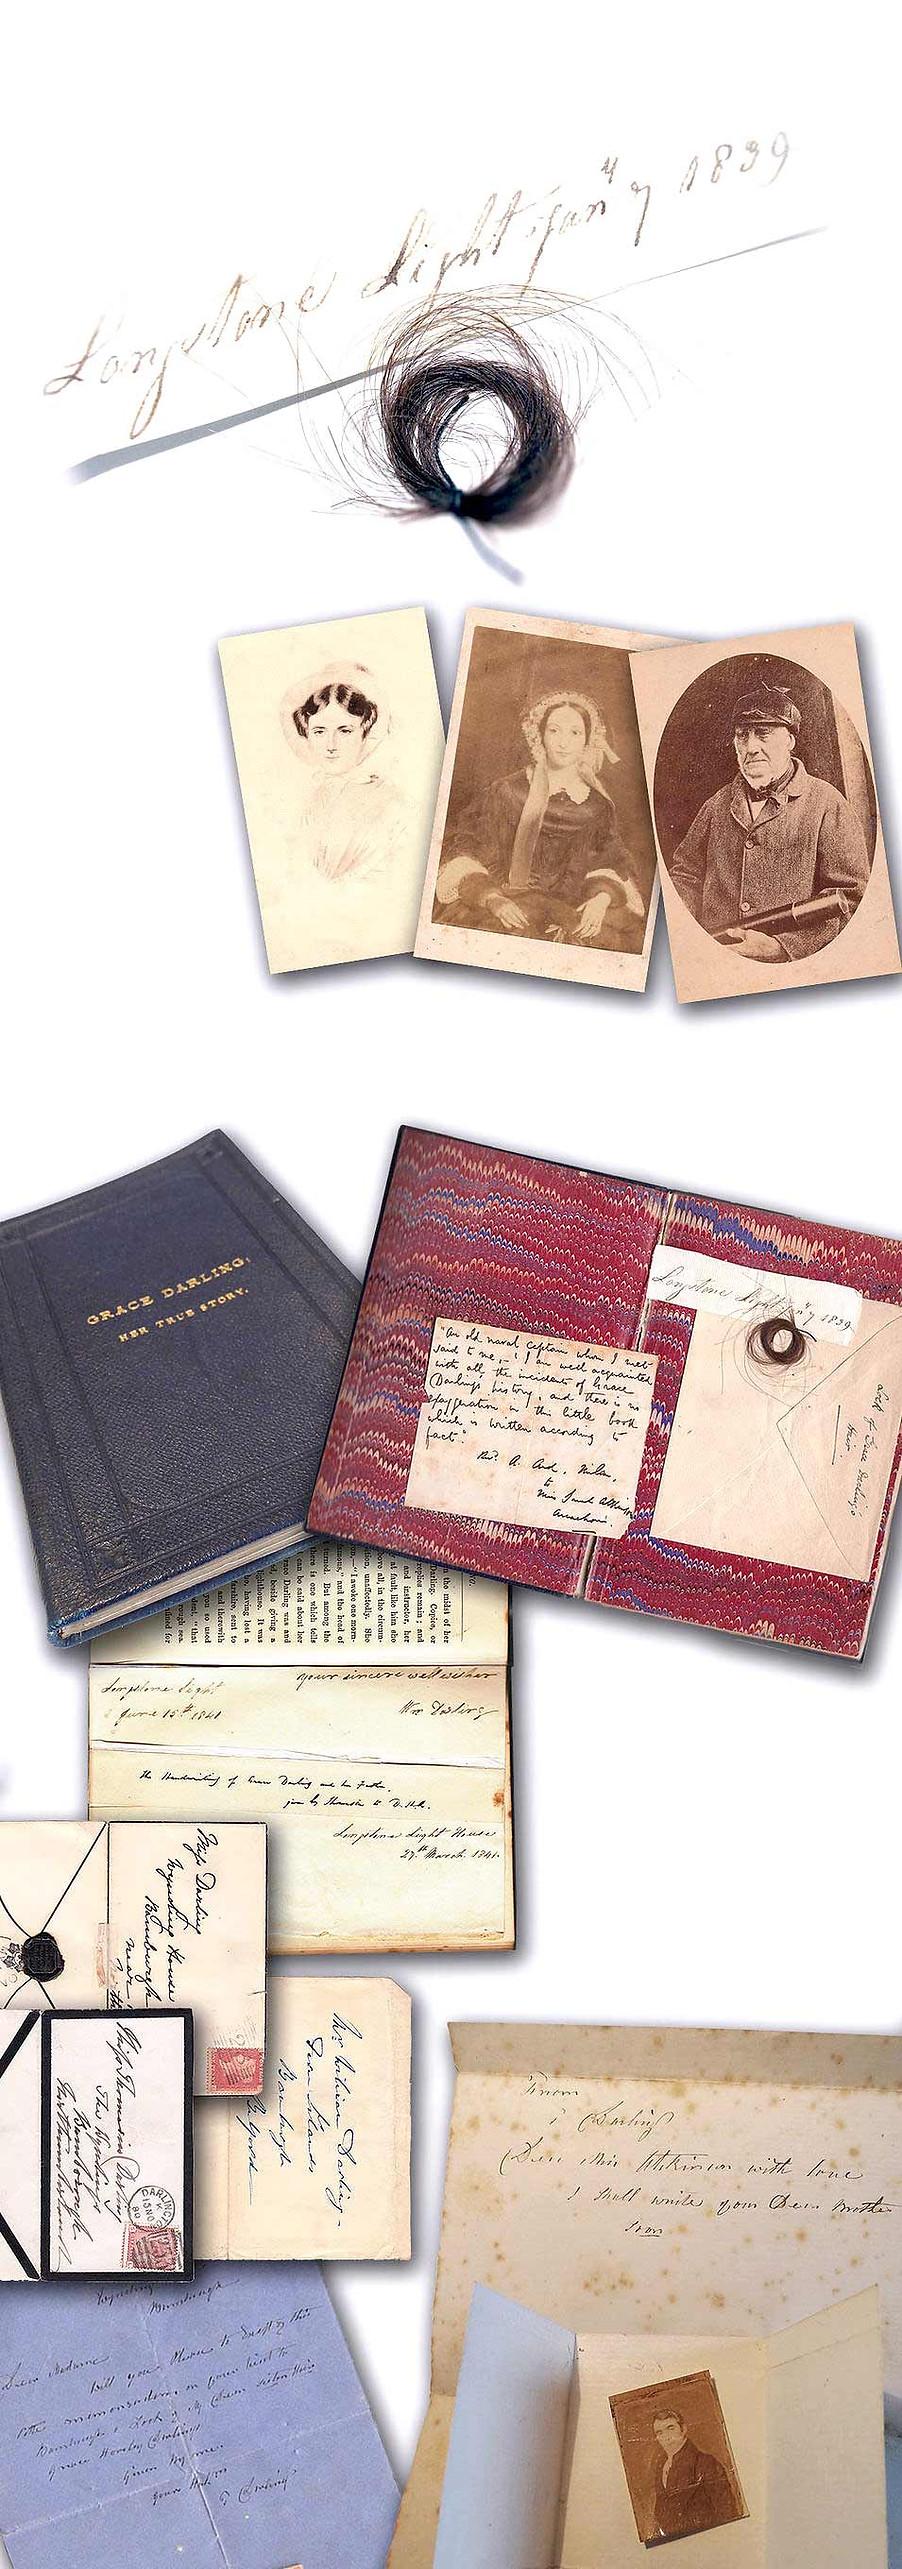 Thomasin-Atkinson Collection .jpg